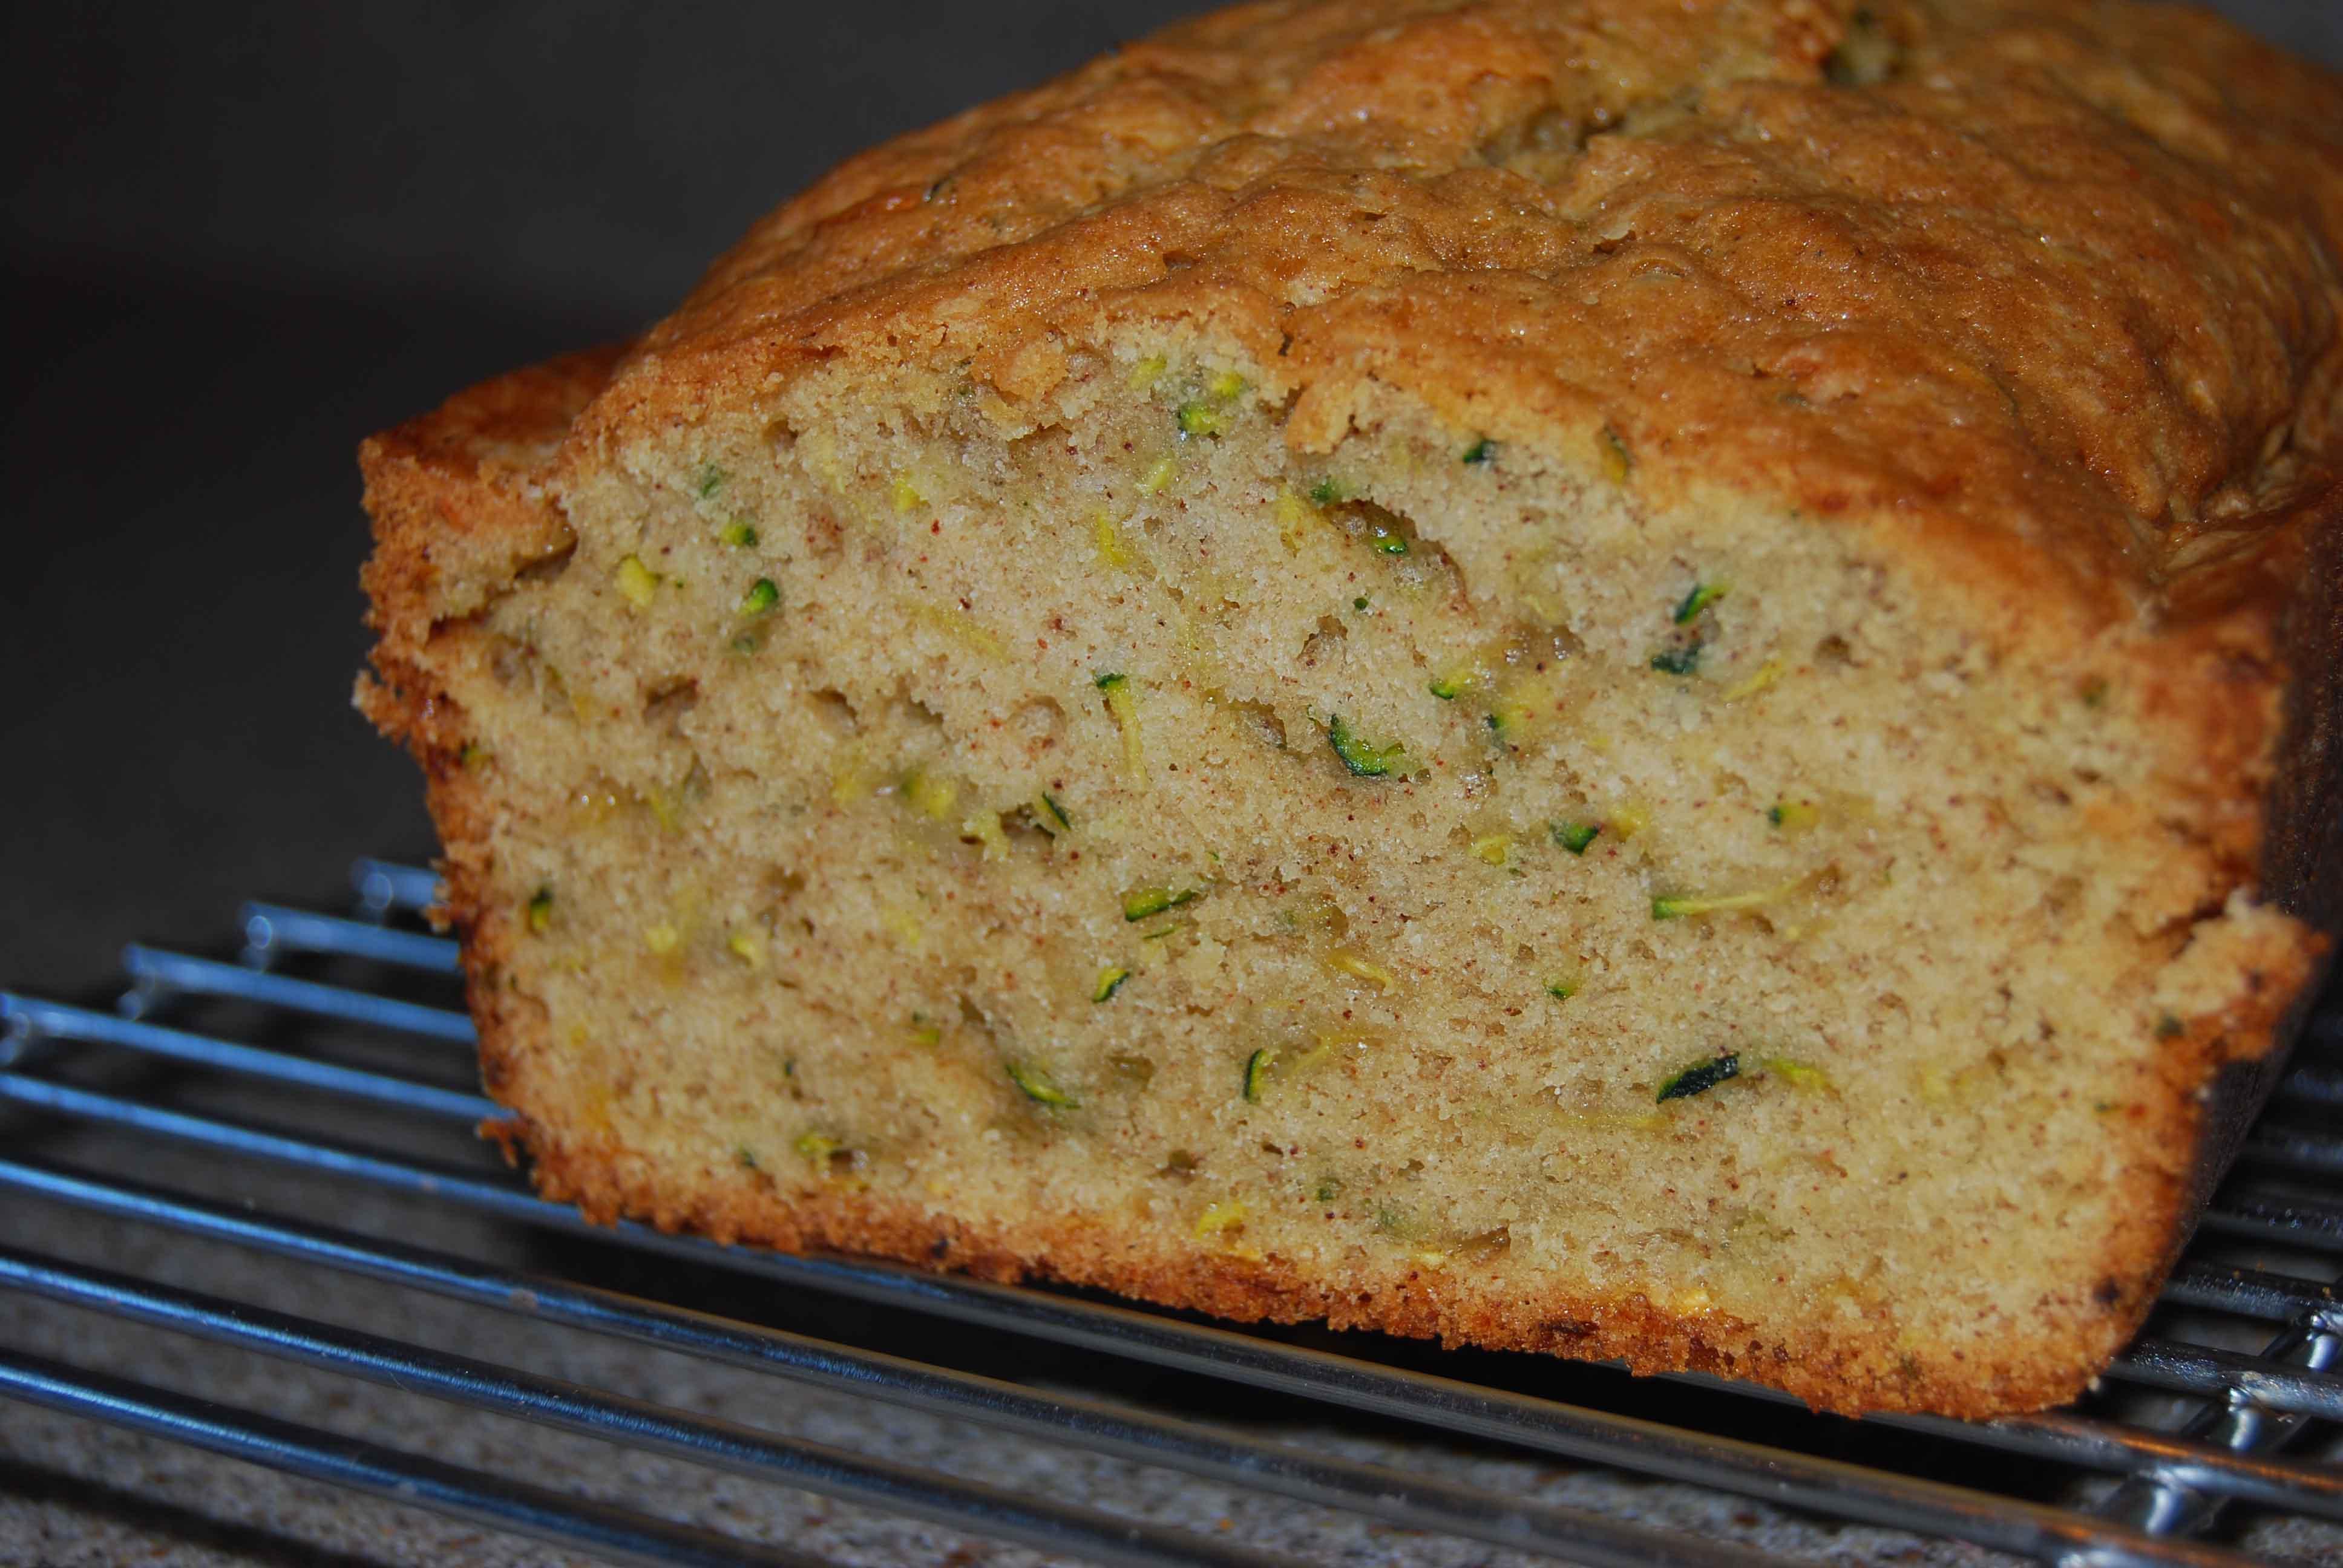 April 25: National Zucchini Bread Day